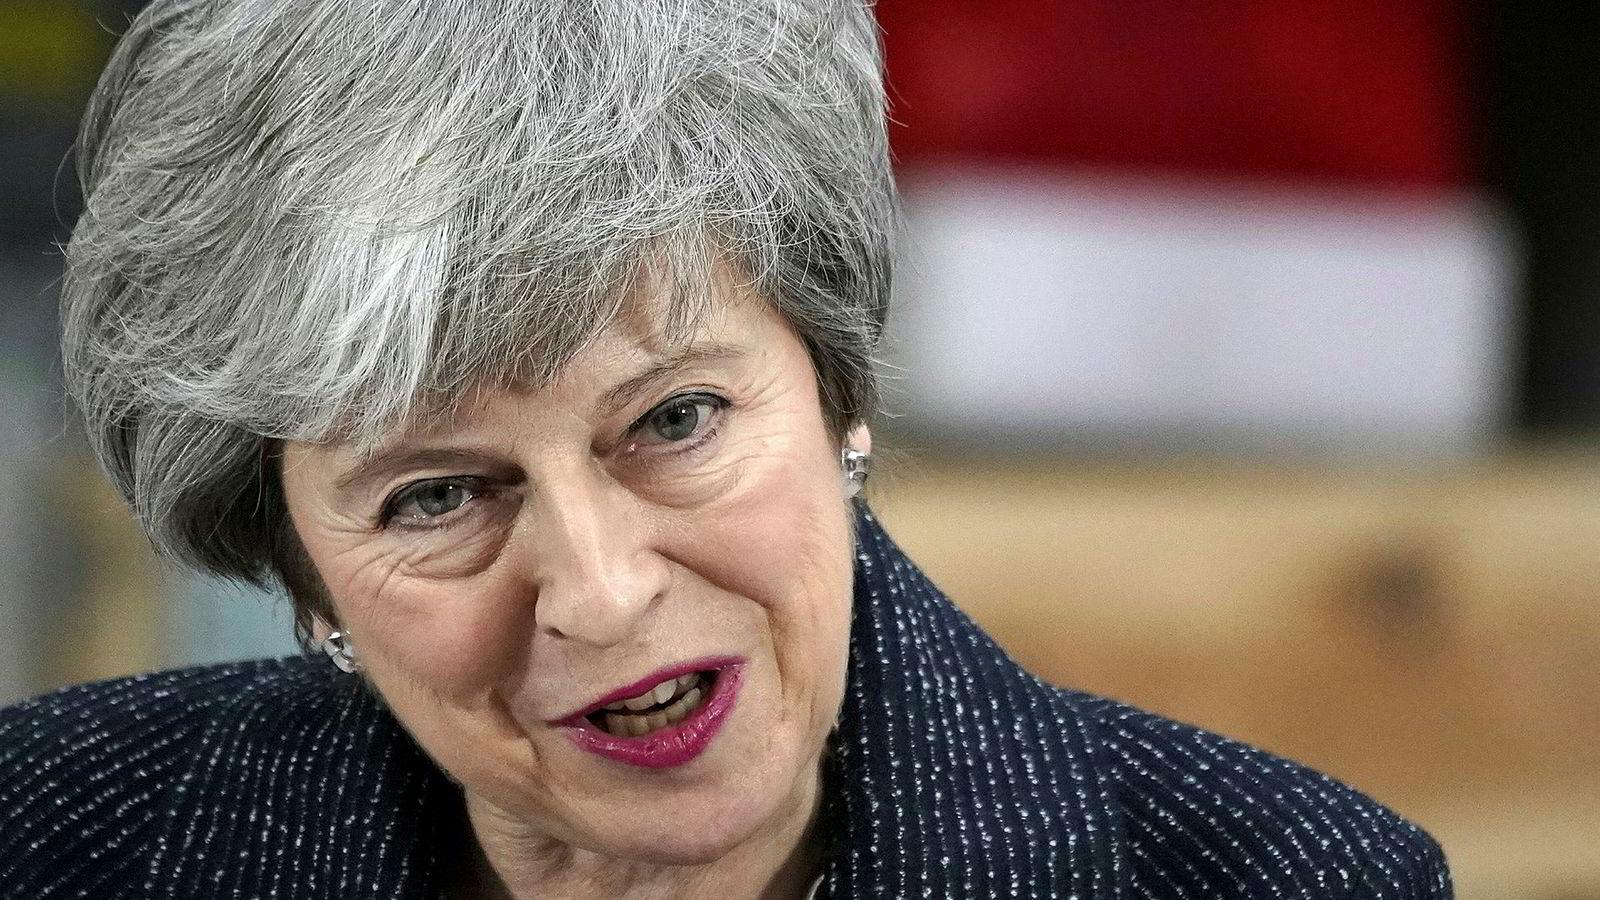 Tirsdag, onsdag og torsdag skal det britiske parlamentet stemme over statsminister Theresa Mays forslag til skilsmisseavtale.